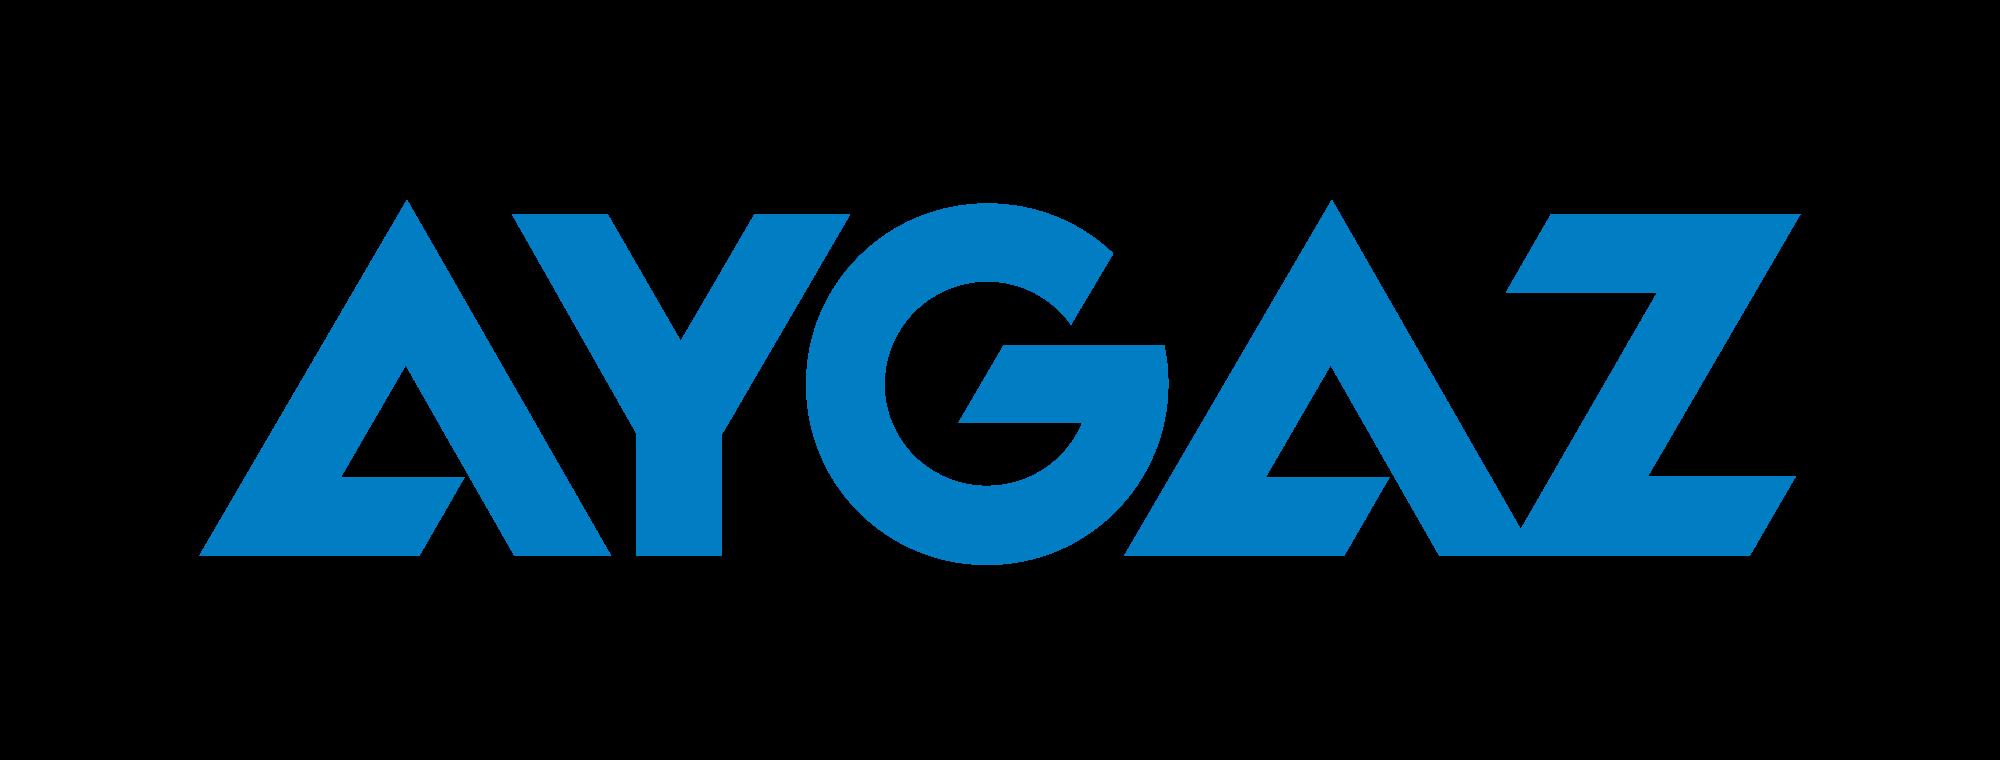 Aygaz PNG